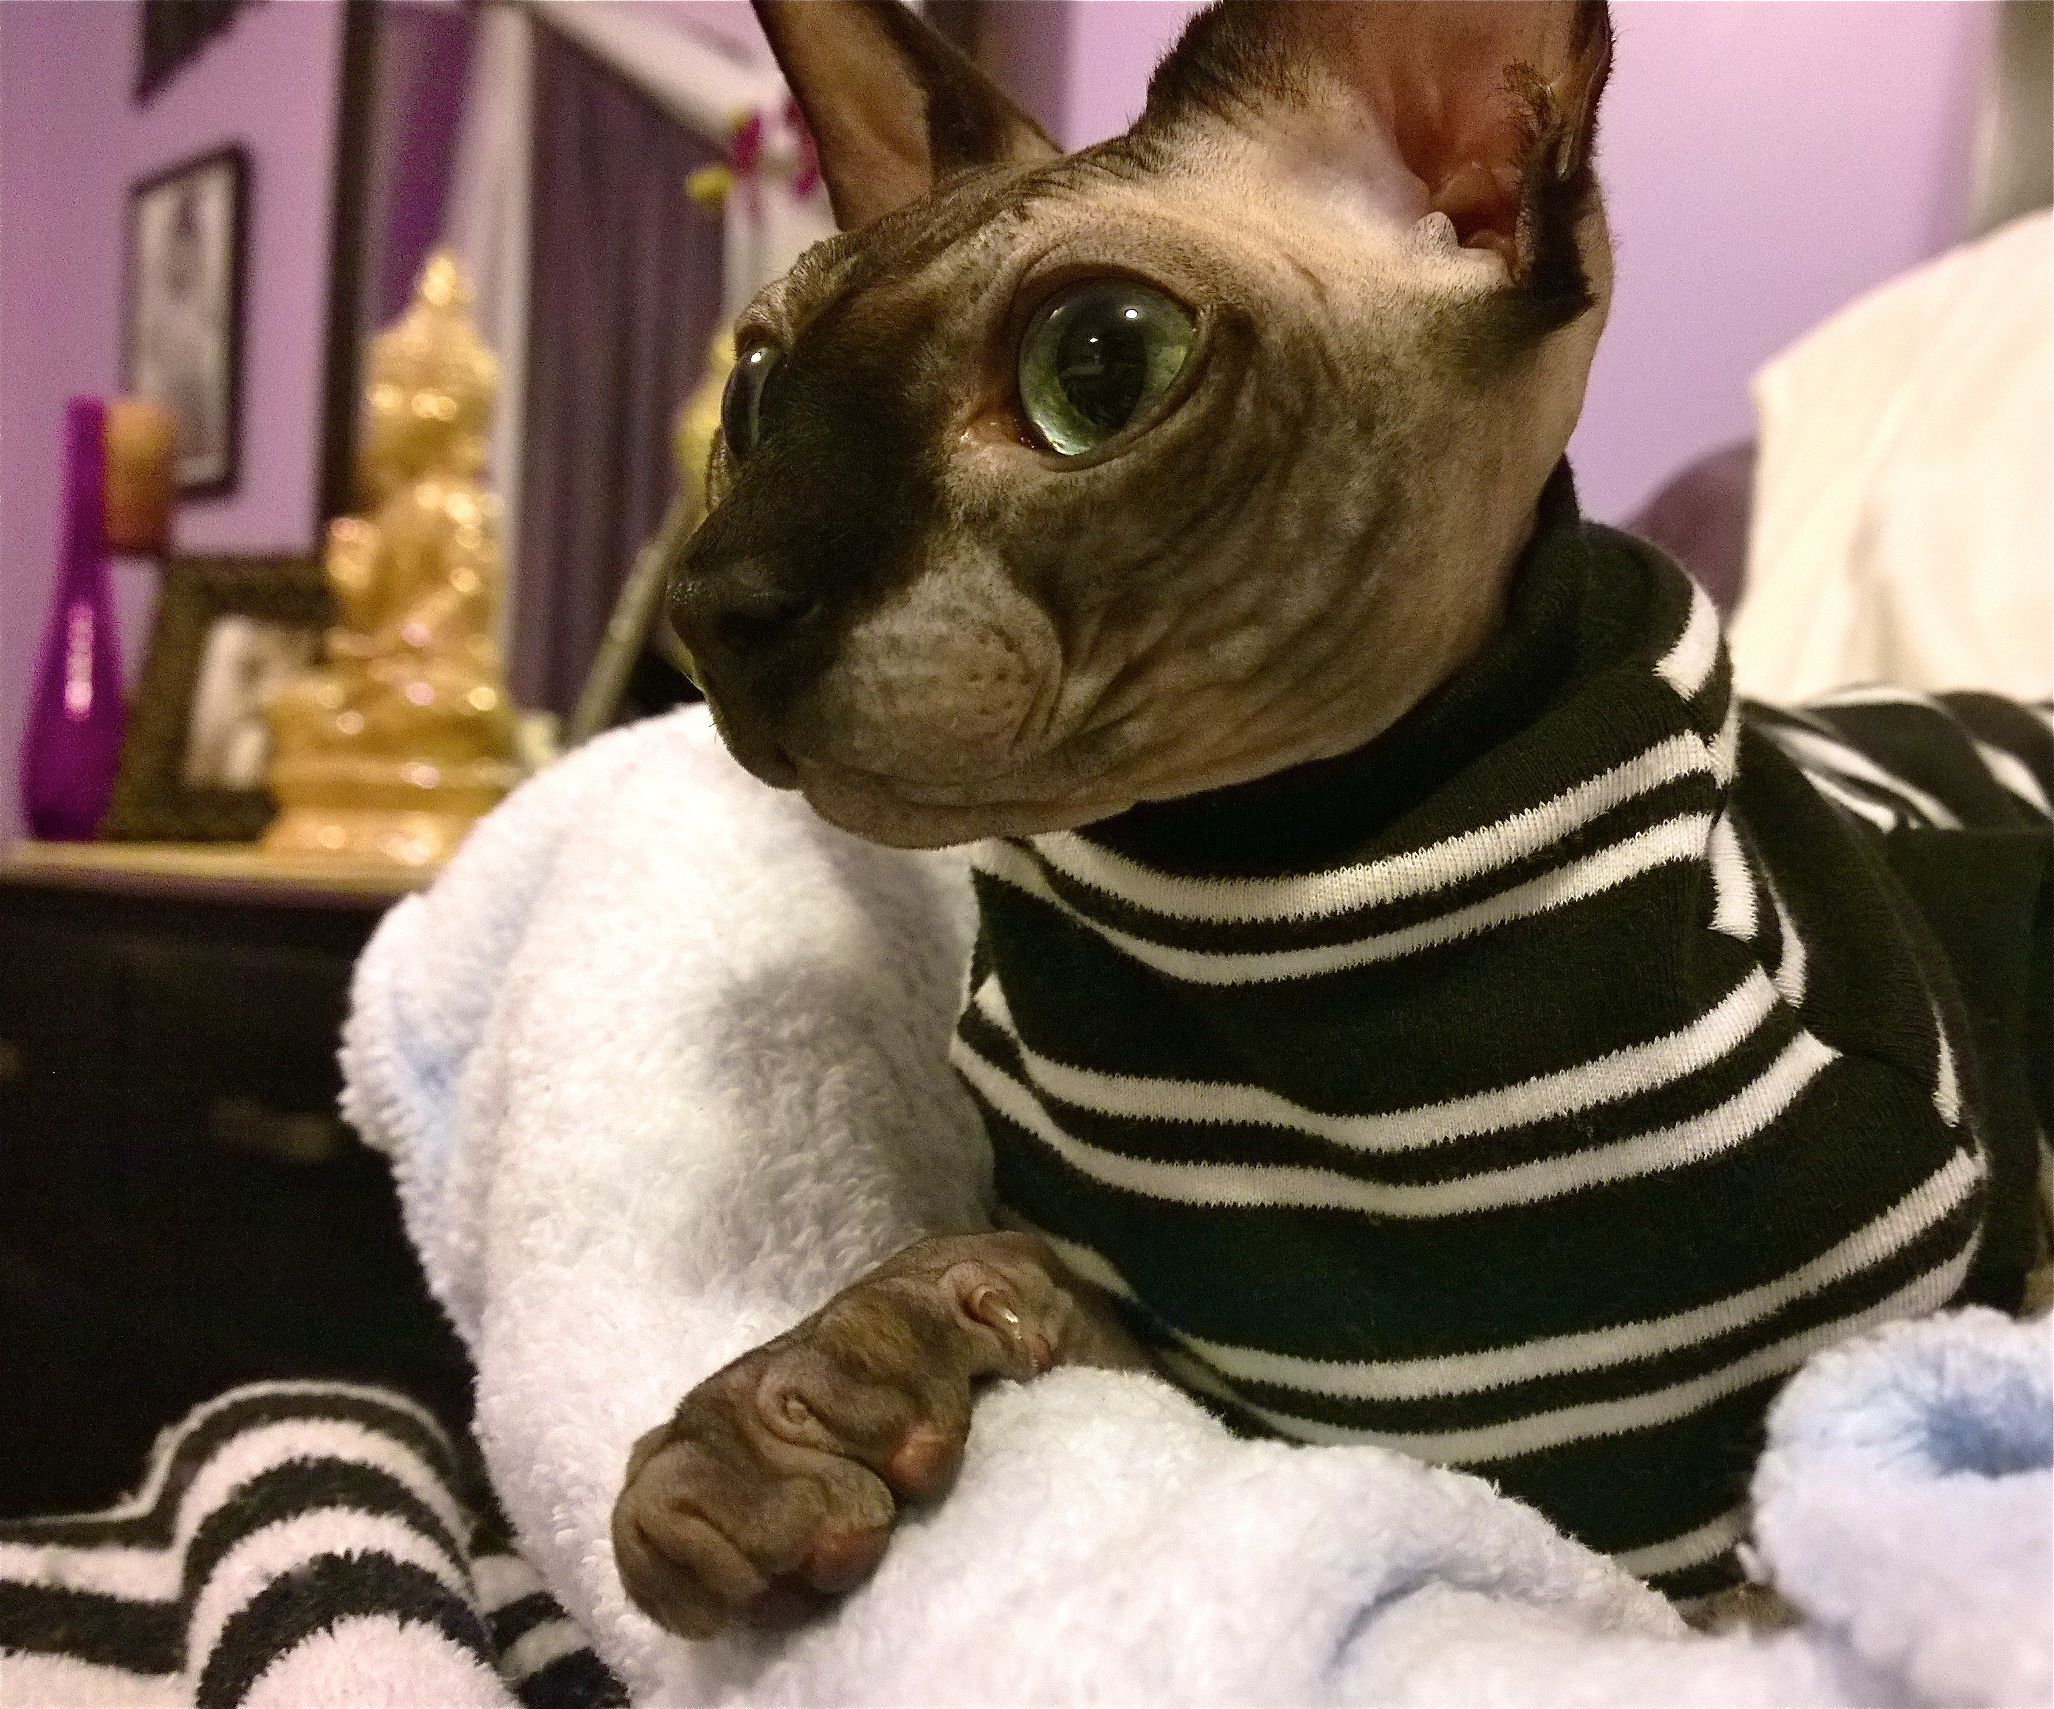 Mason Star Https Www Facebook Com Poshpunksphynxline Ref Hl Sphinx Cat Dog Pictures Sphynx